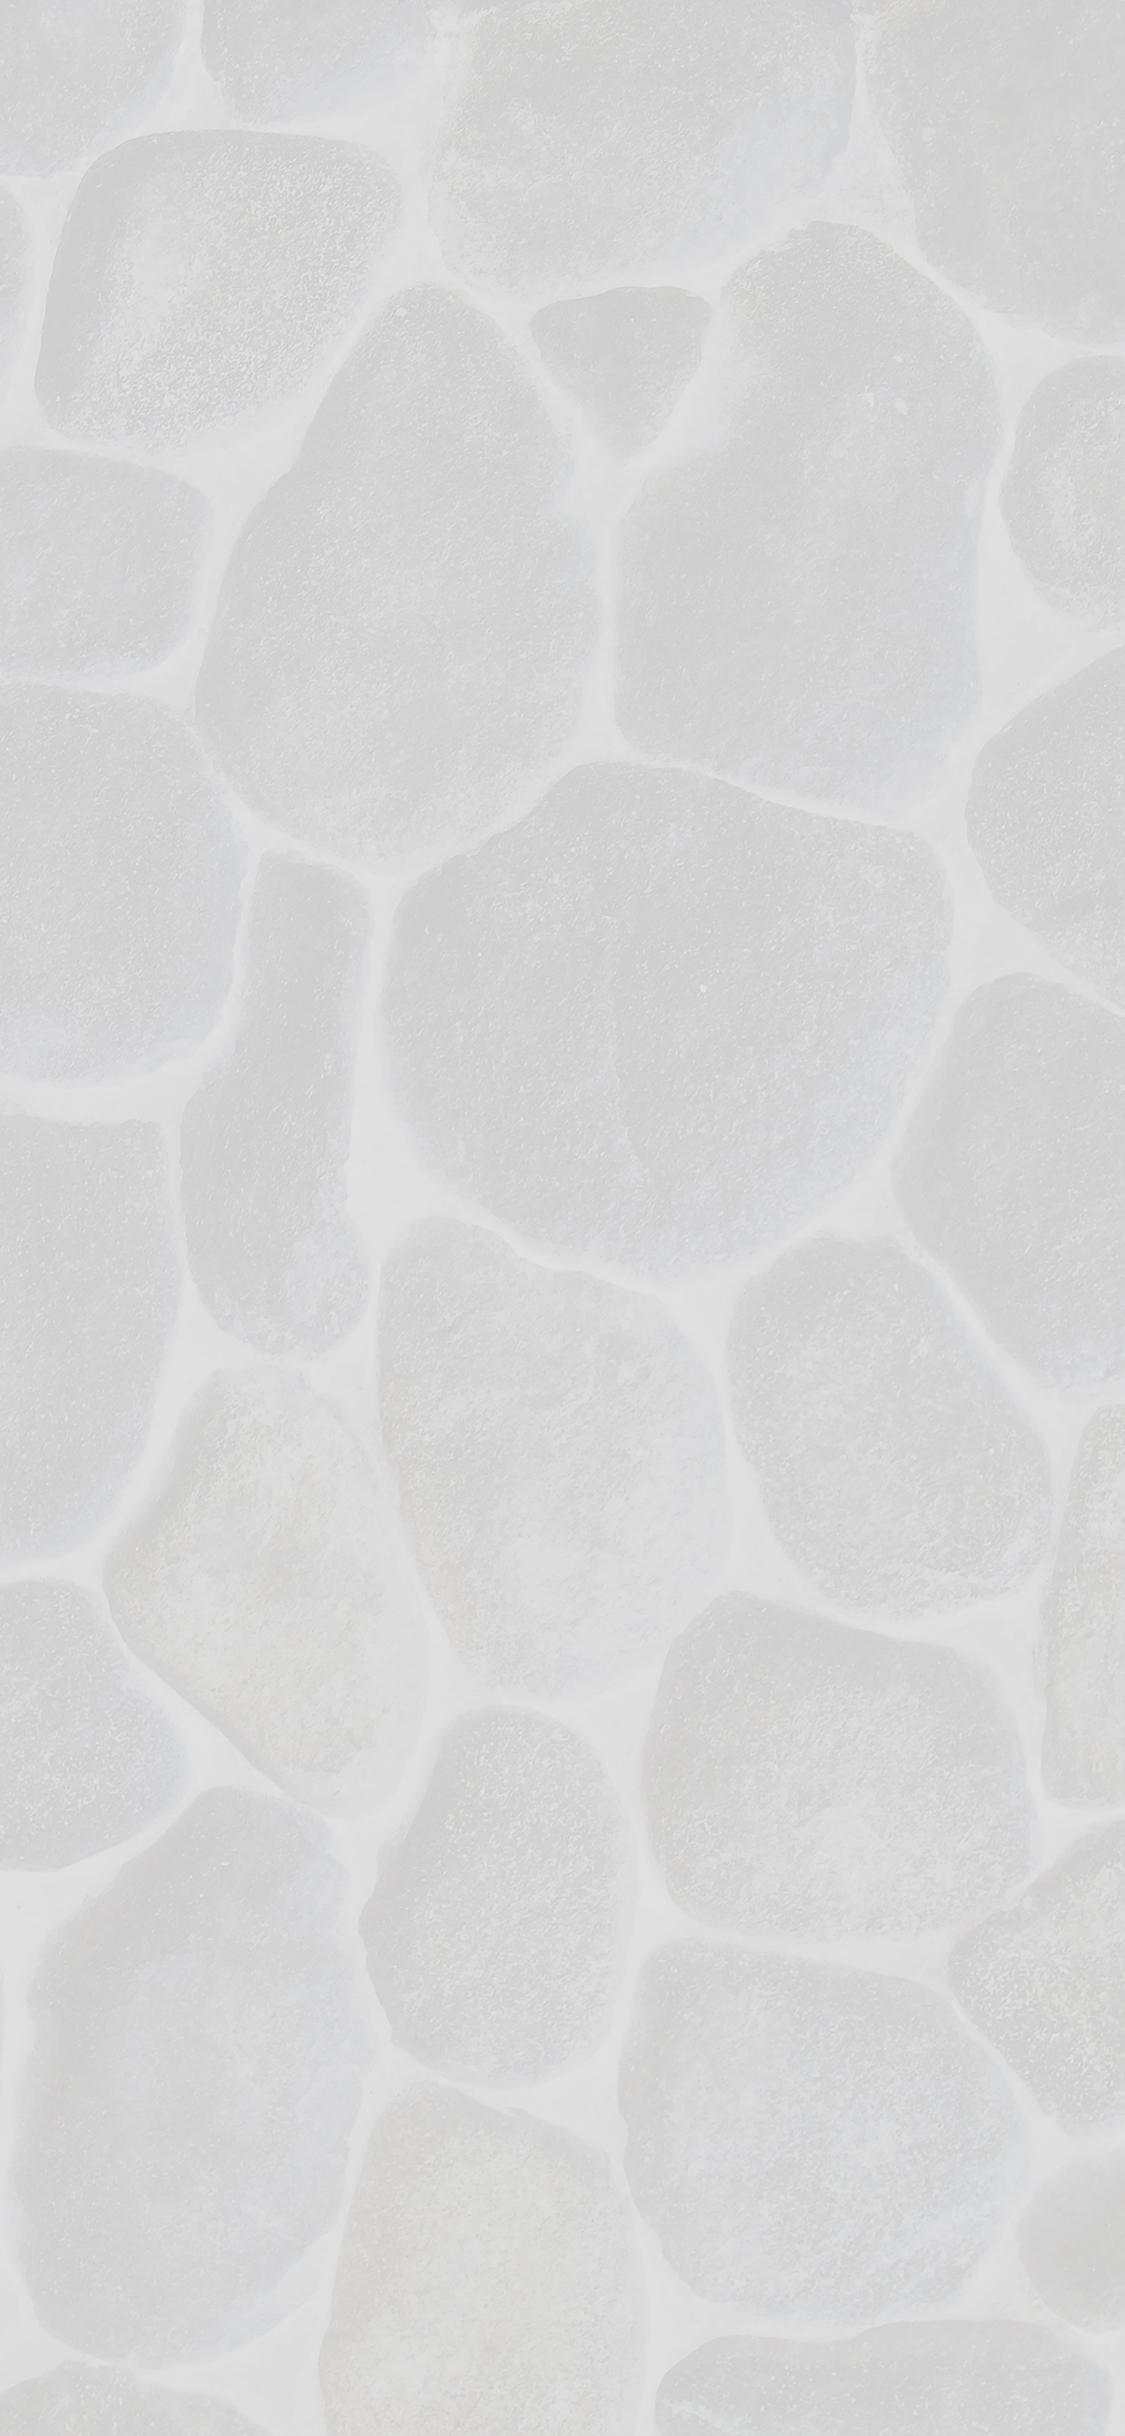 iPhoneXpapers.com-Apple-iPhone-wallpaper-me46-stone-texture-light-backwall